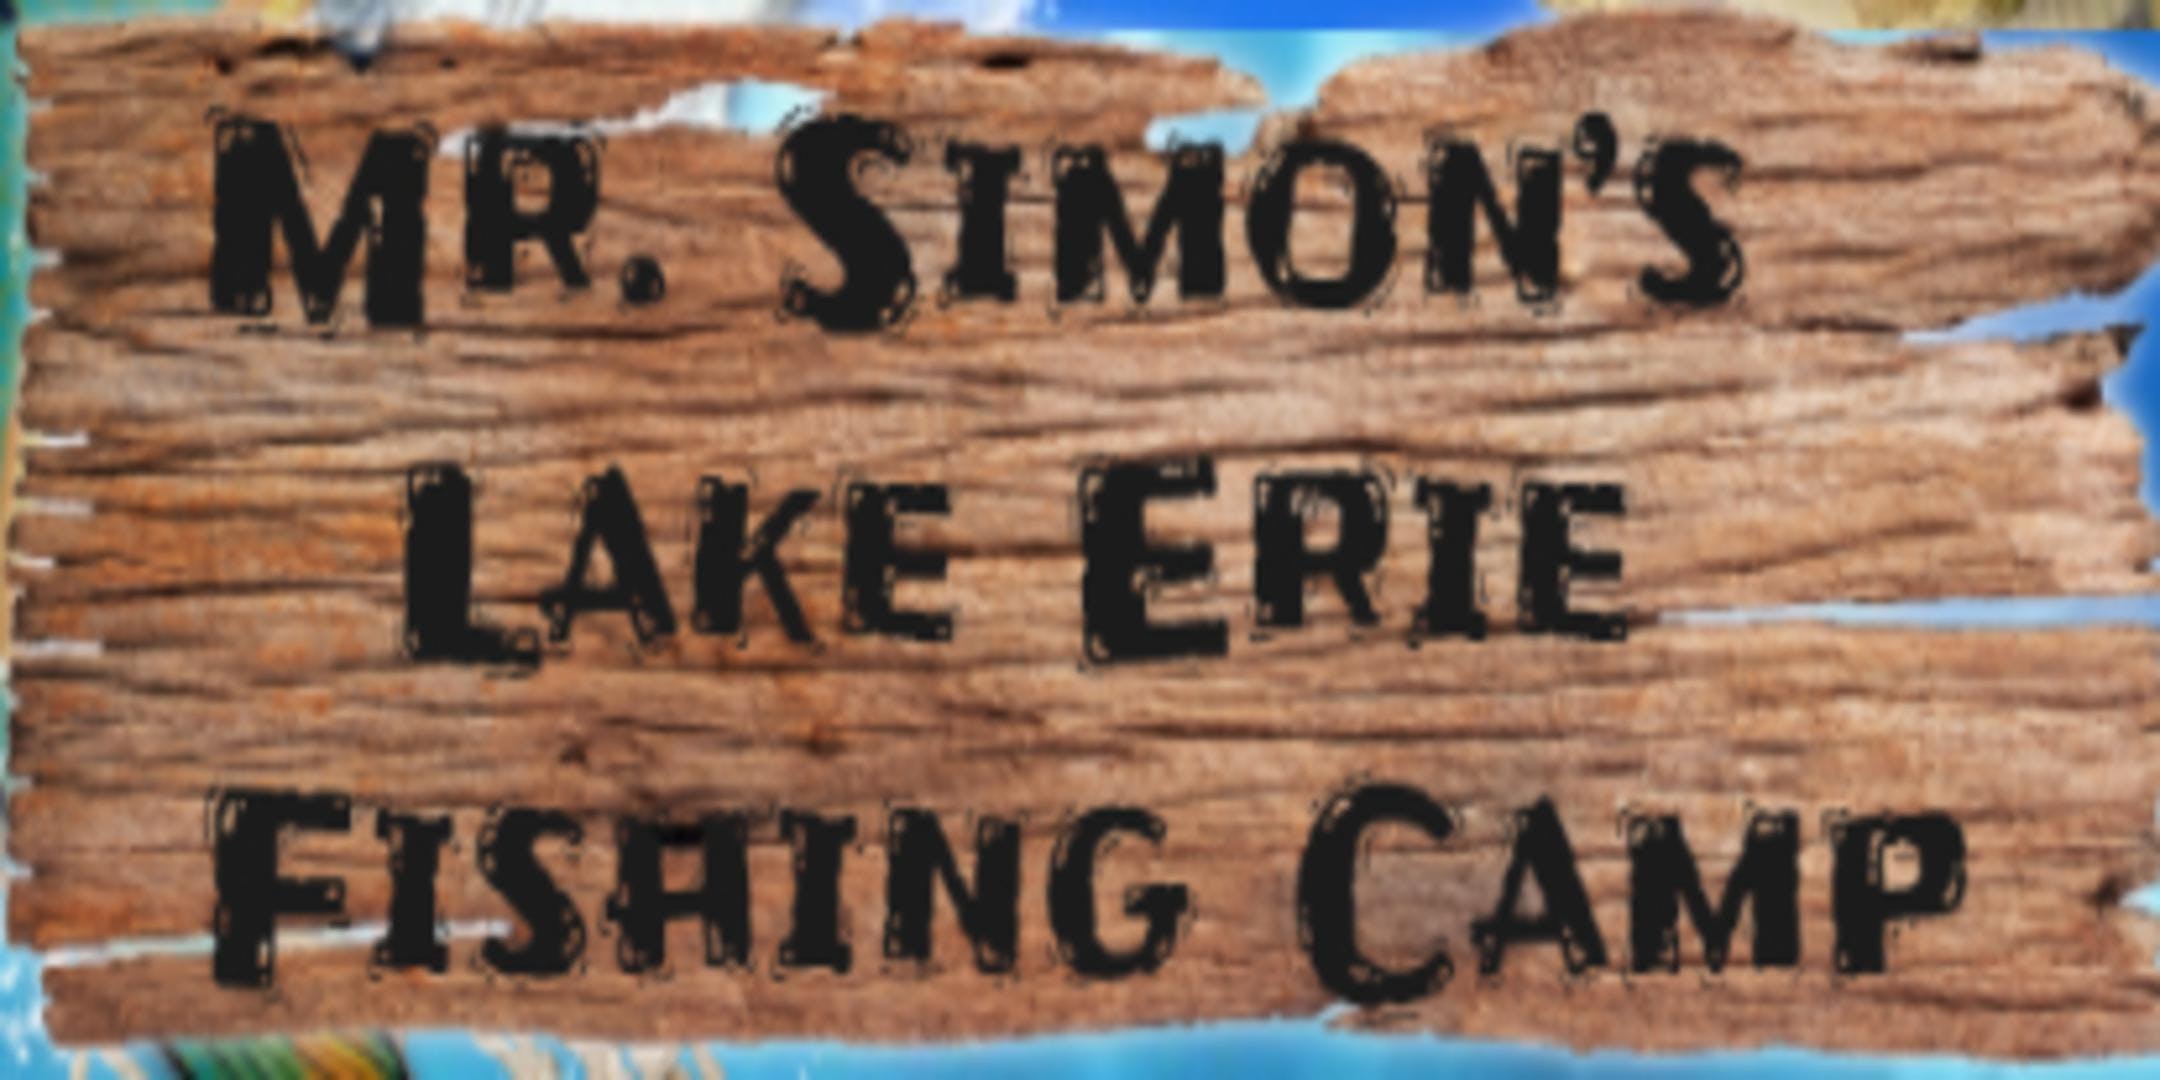 Mr. Simons Lake Erie Fishing Camp